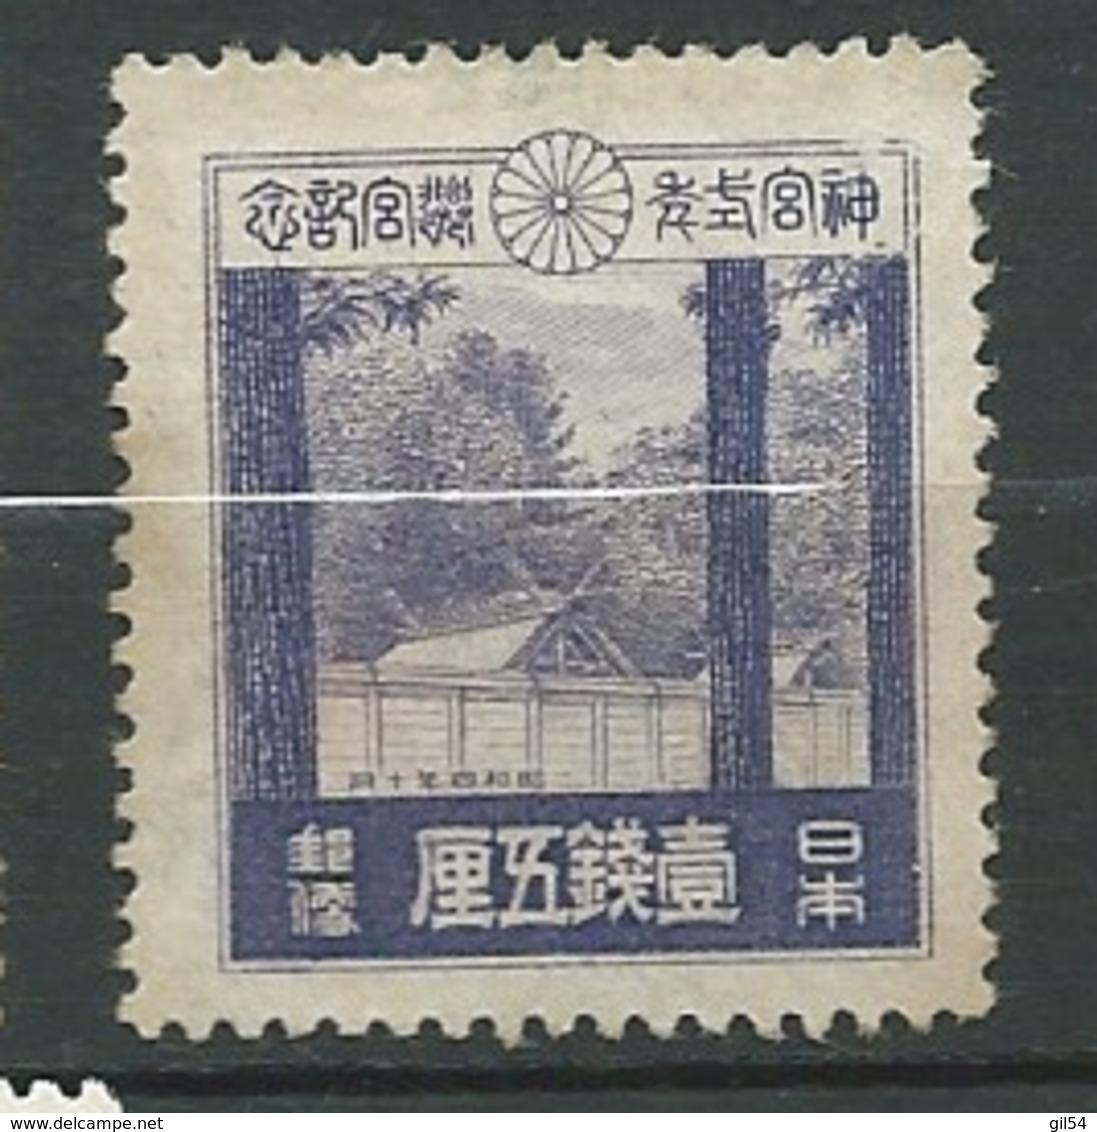 Japon - Yvert N° 207 (*)  Gomme Altérée   -   Ava27510 - Unused Stamps